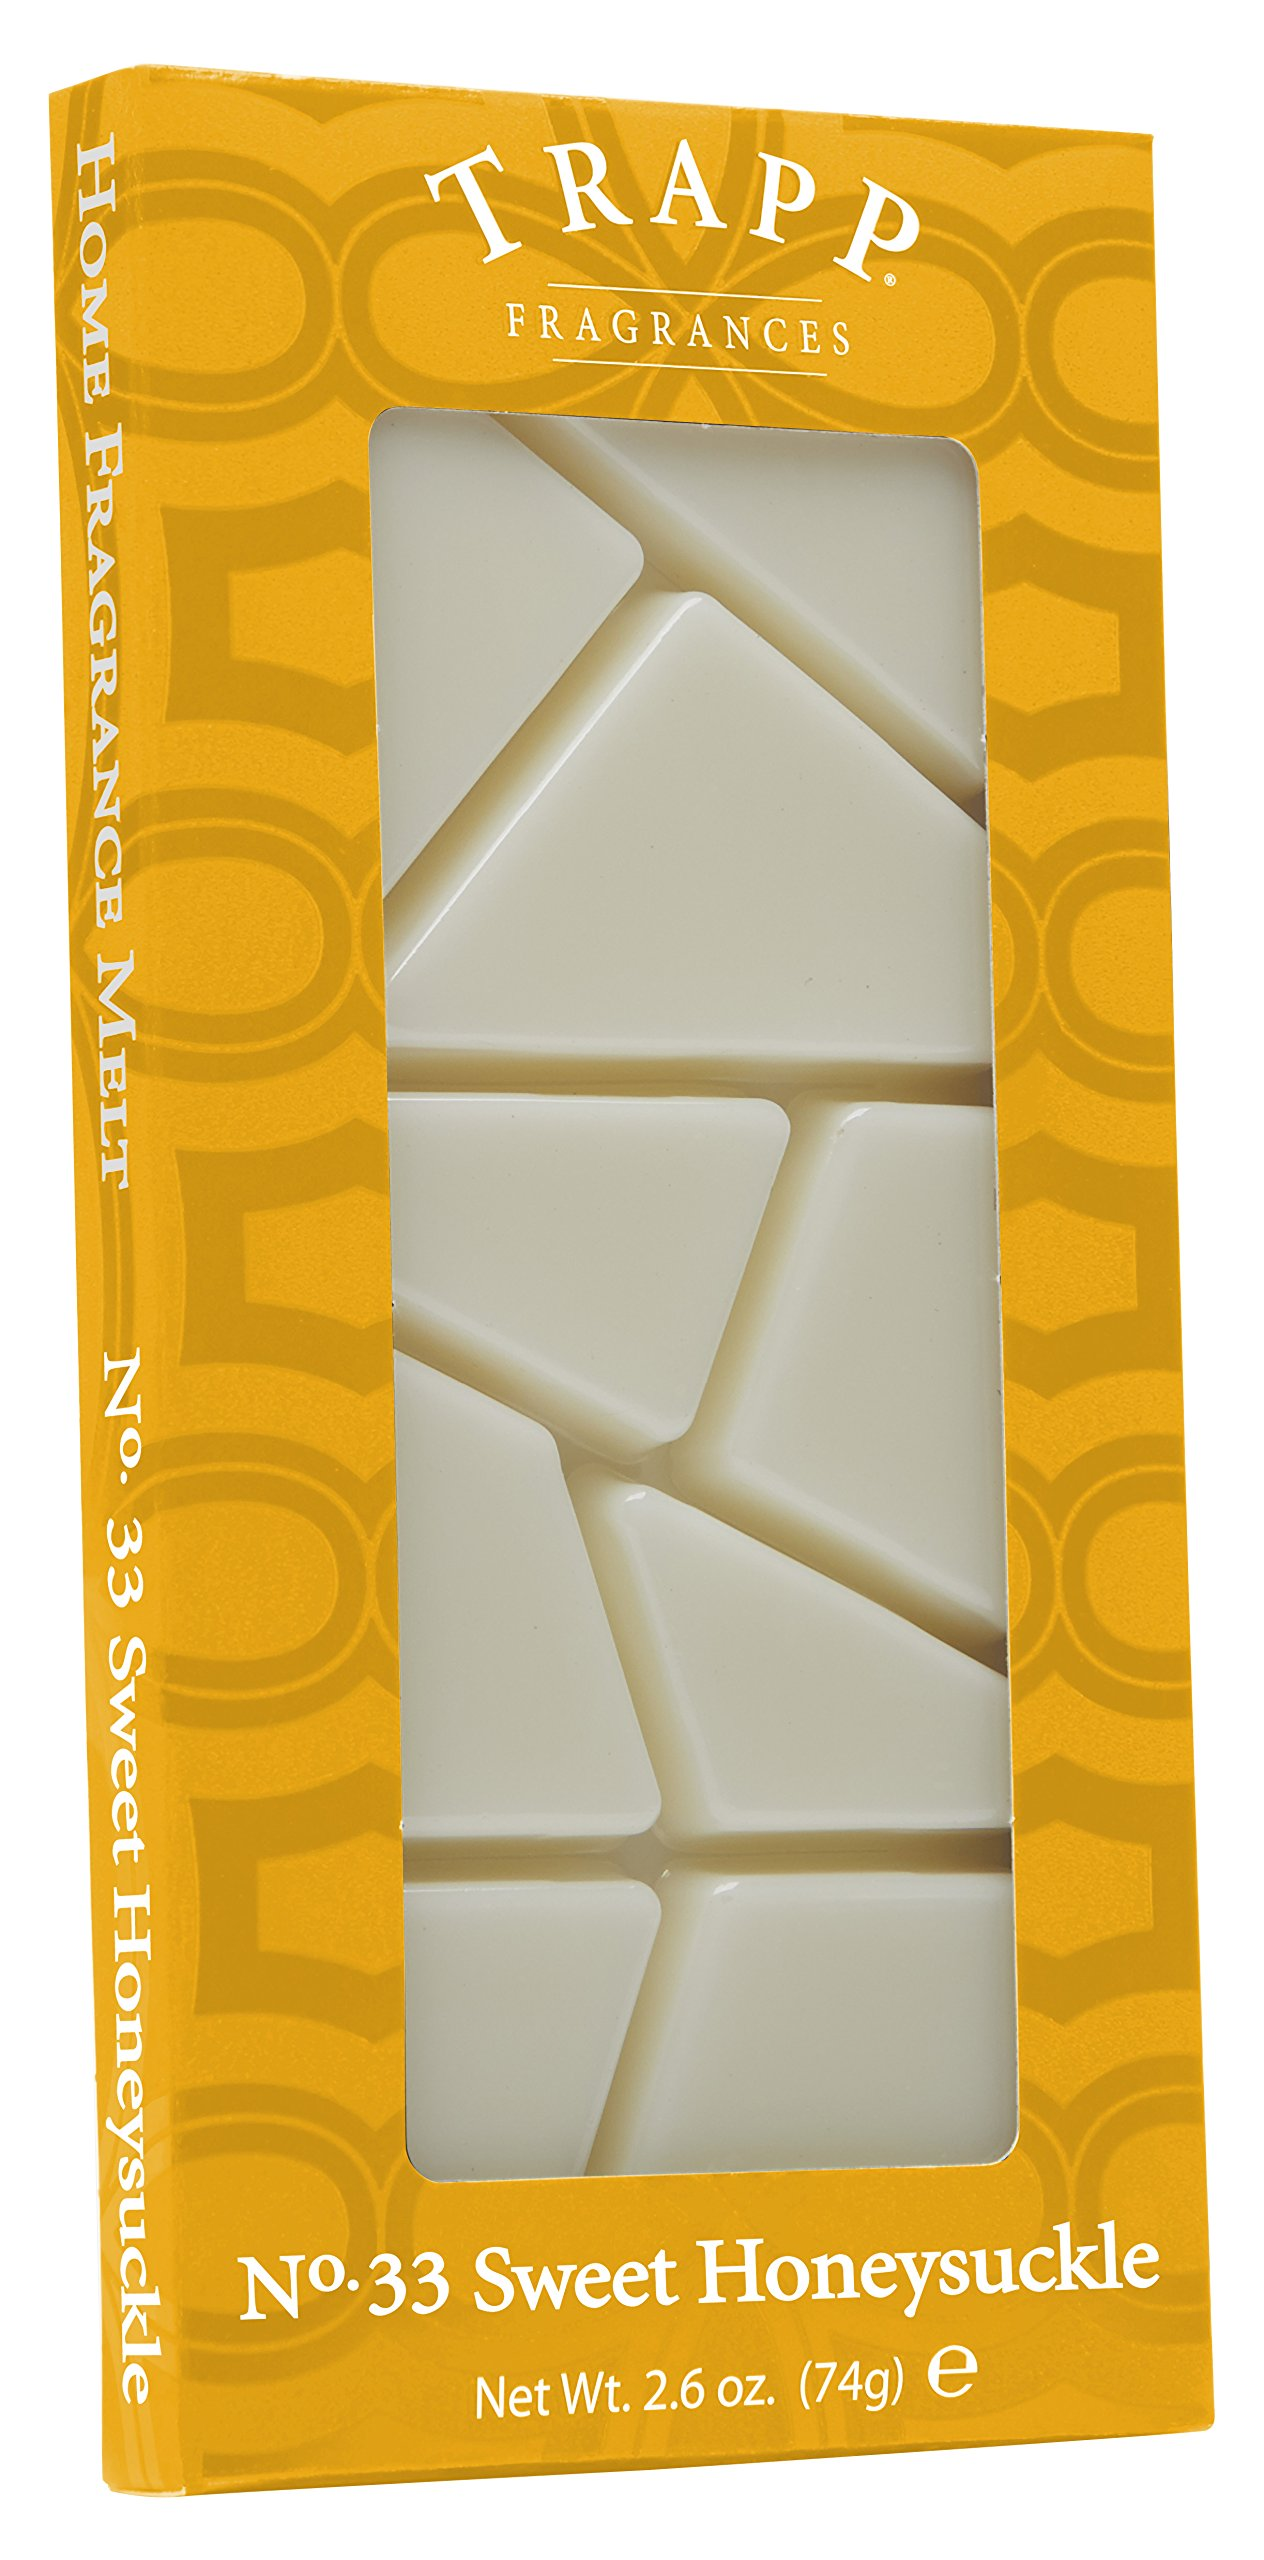 Trapp Home Fragrance Melt, No. 33 Sweet Honeysuckle, 2.6-Ounce